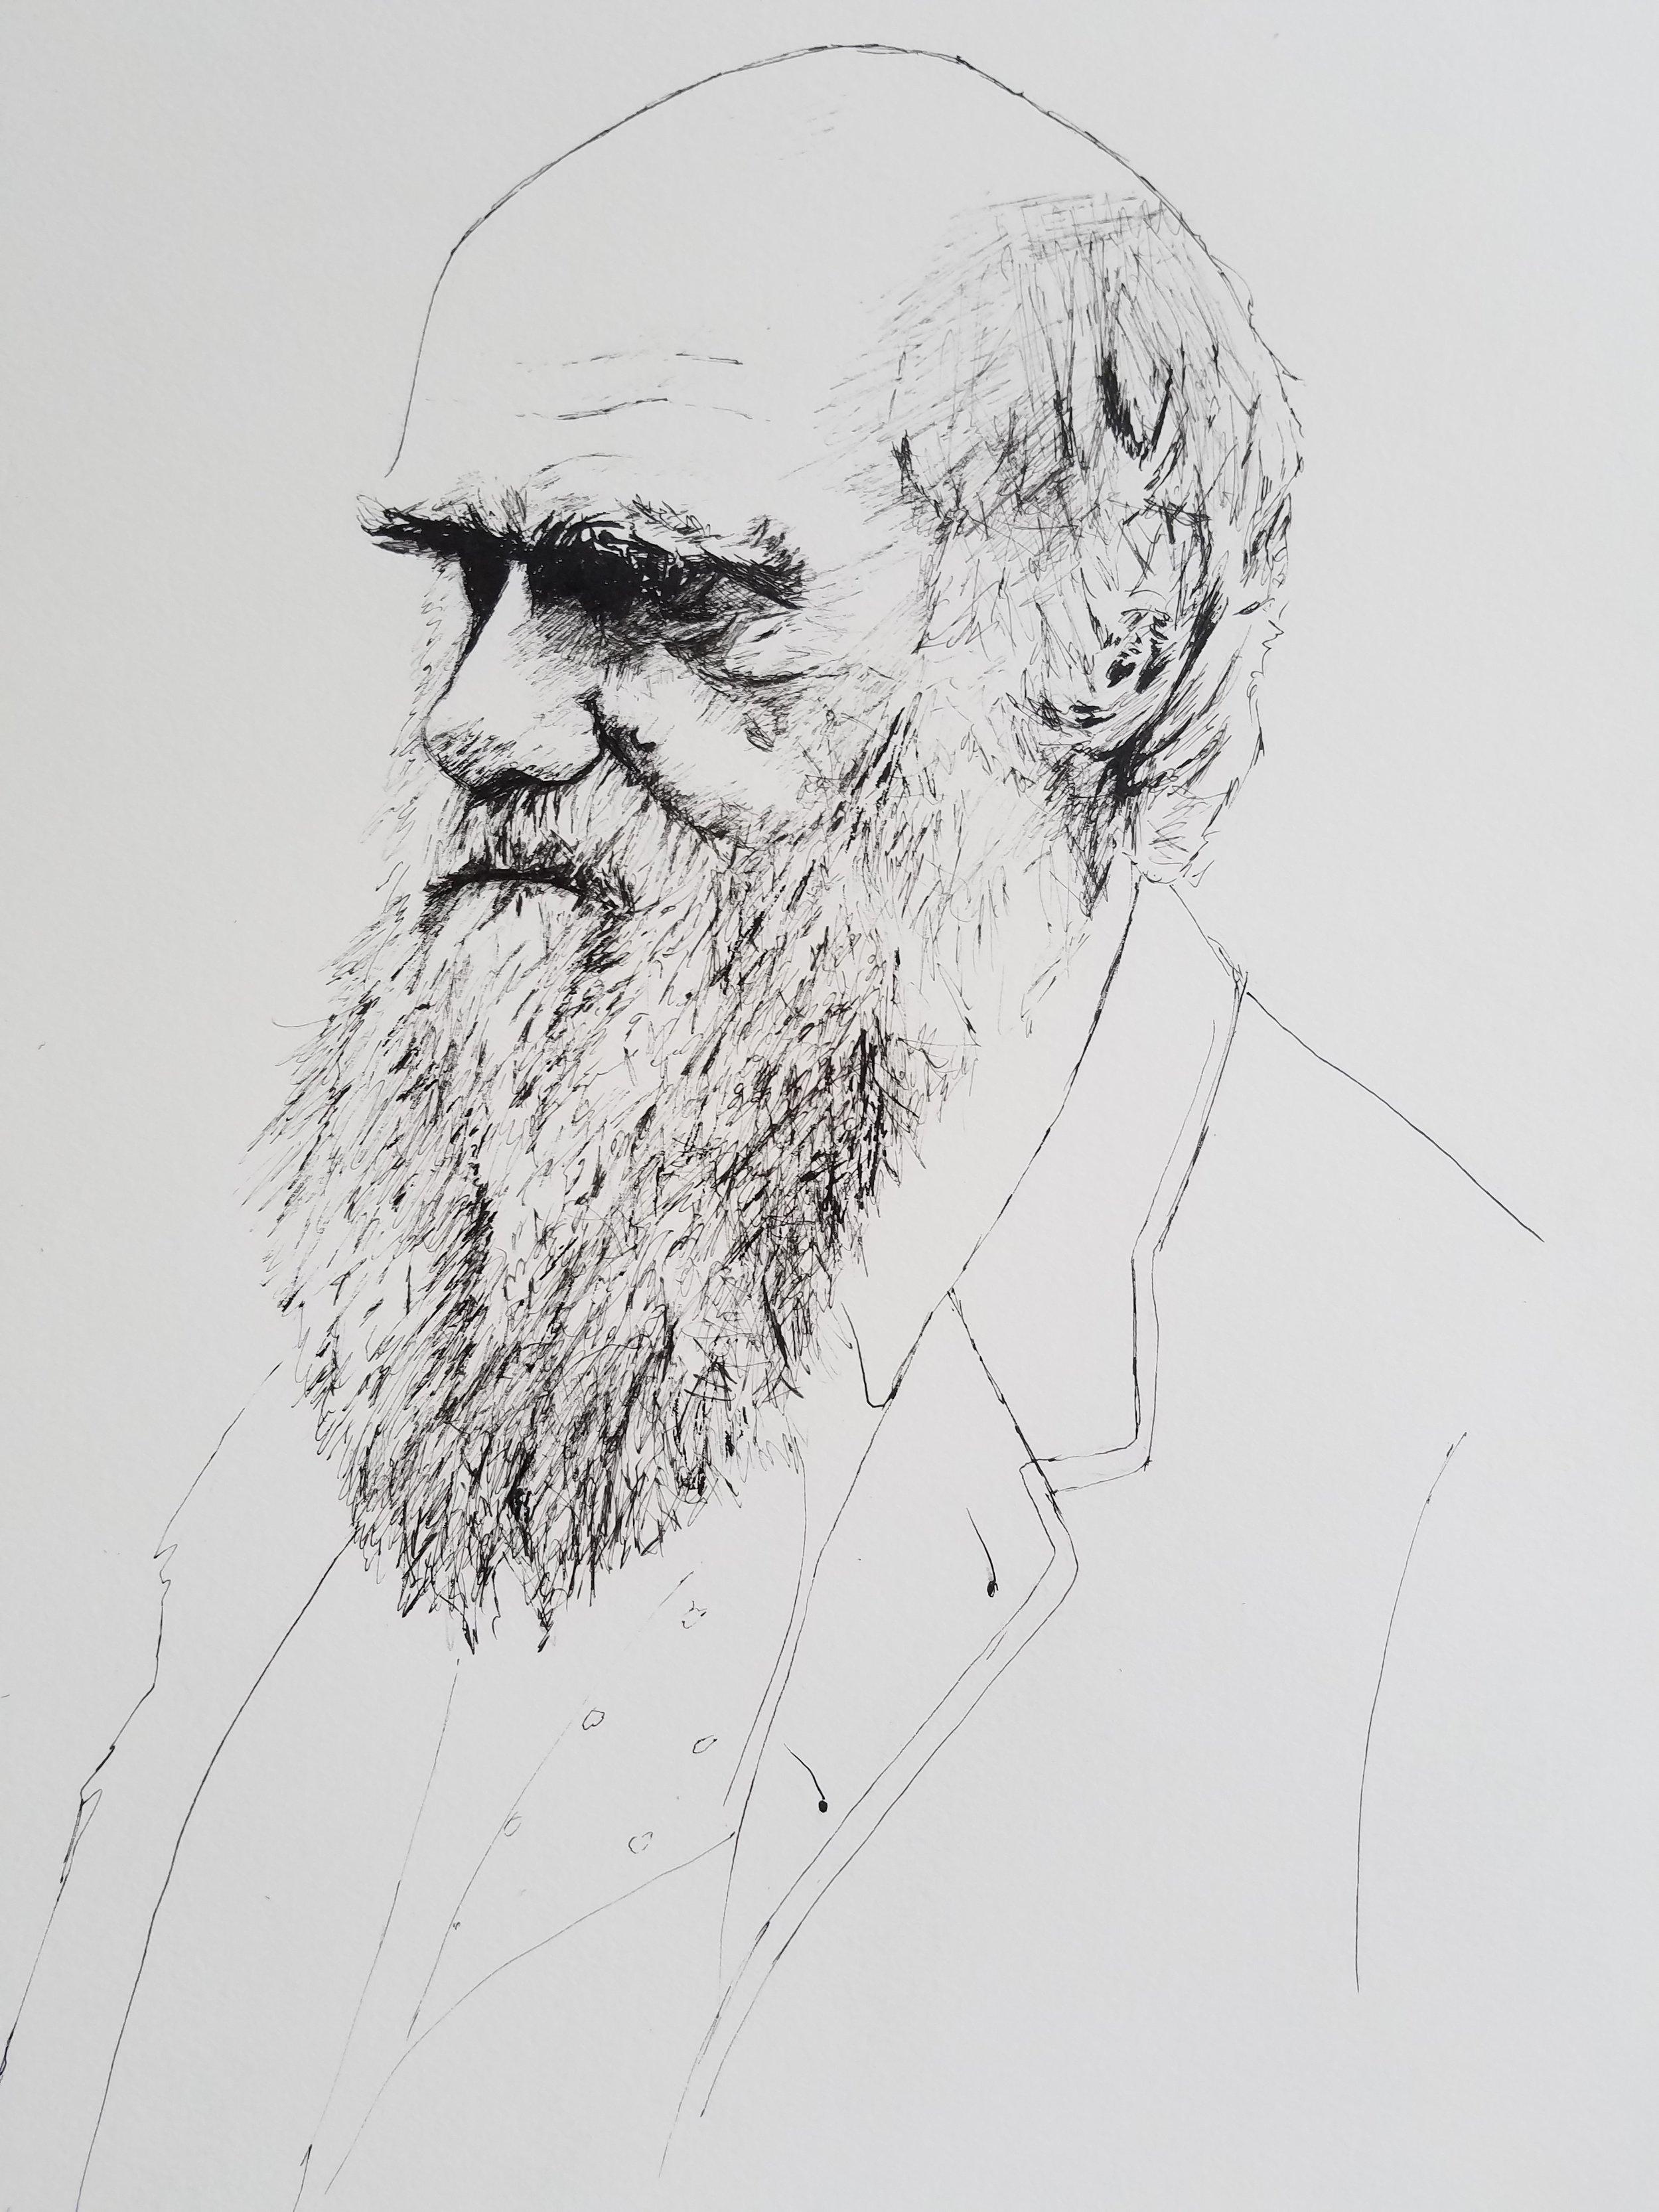 Charles Darwin, pen and ink, 2017